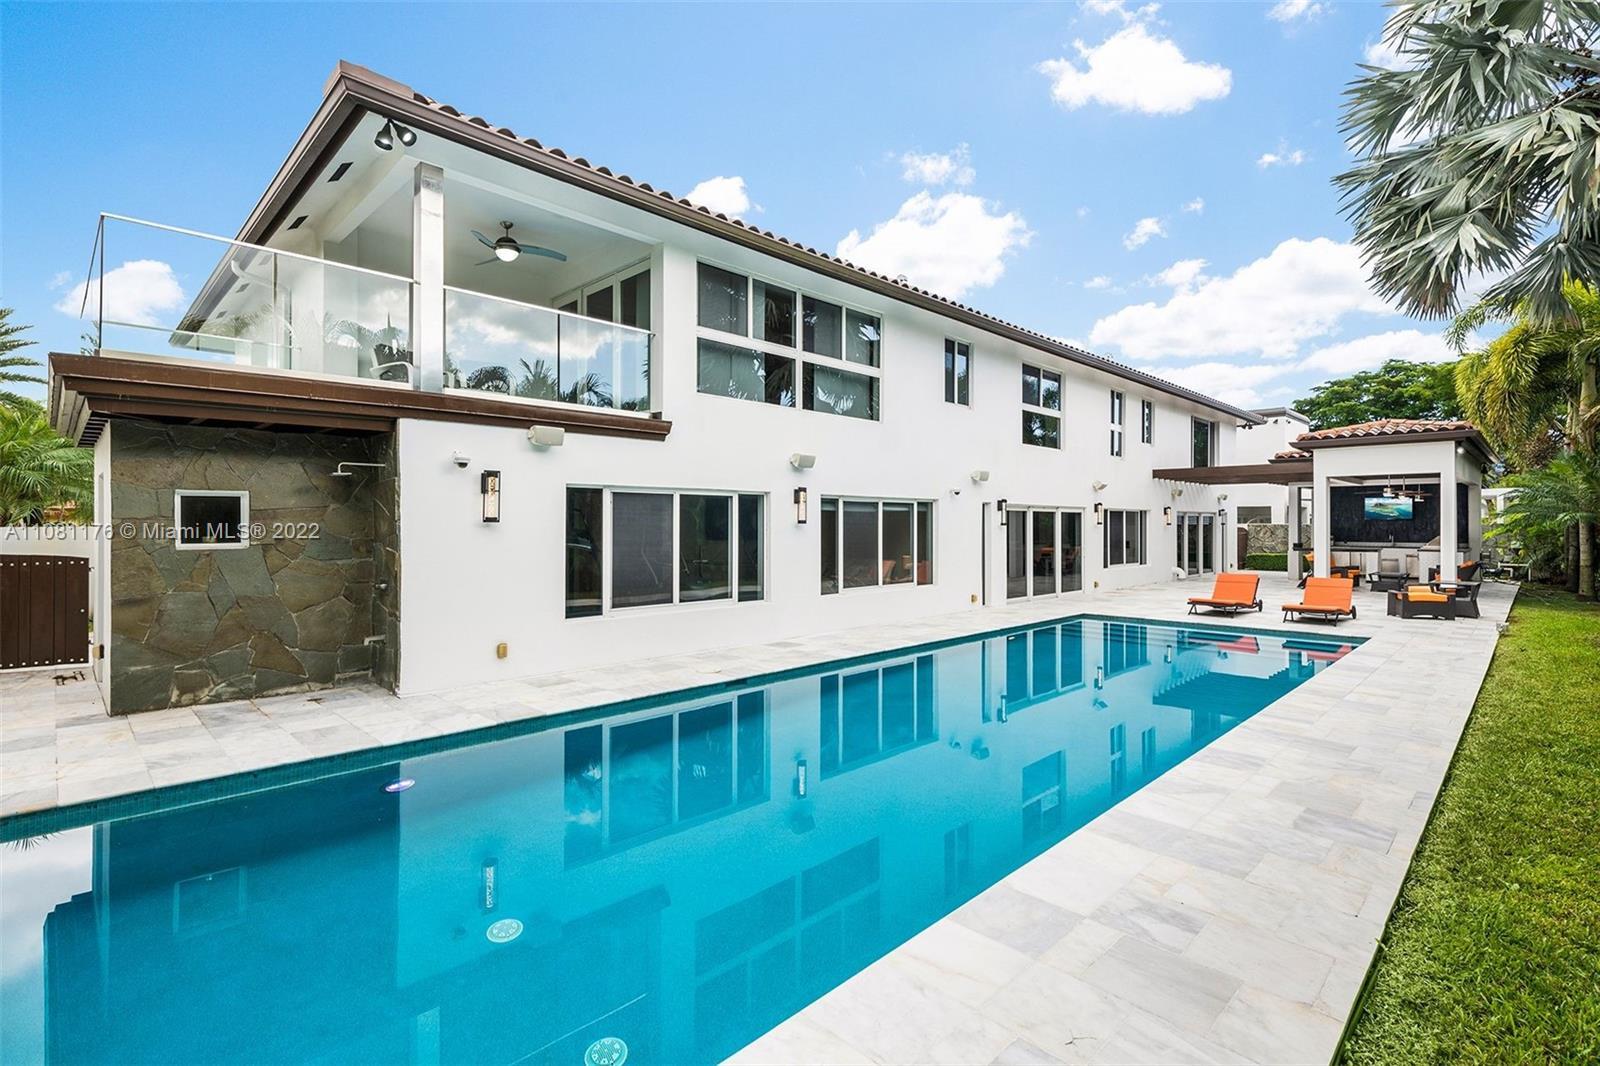 Single Family Home,For Sale,5274 NE 94th Doral Pl, Doral, Florida 33178,Brickell,realty,broker,condos near me